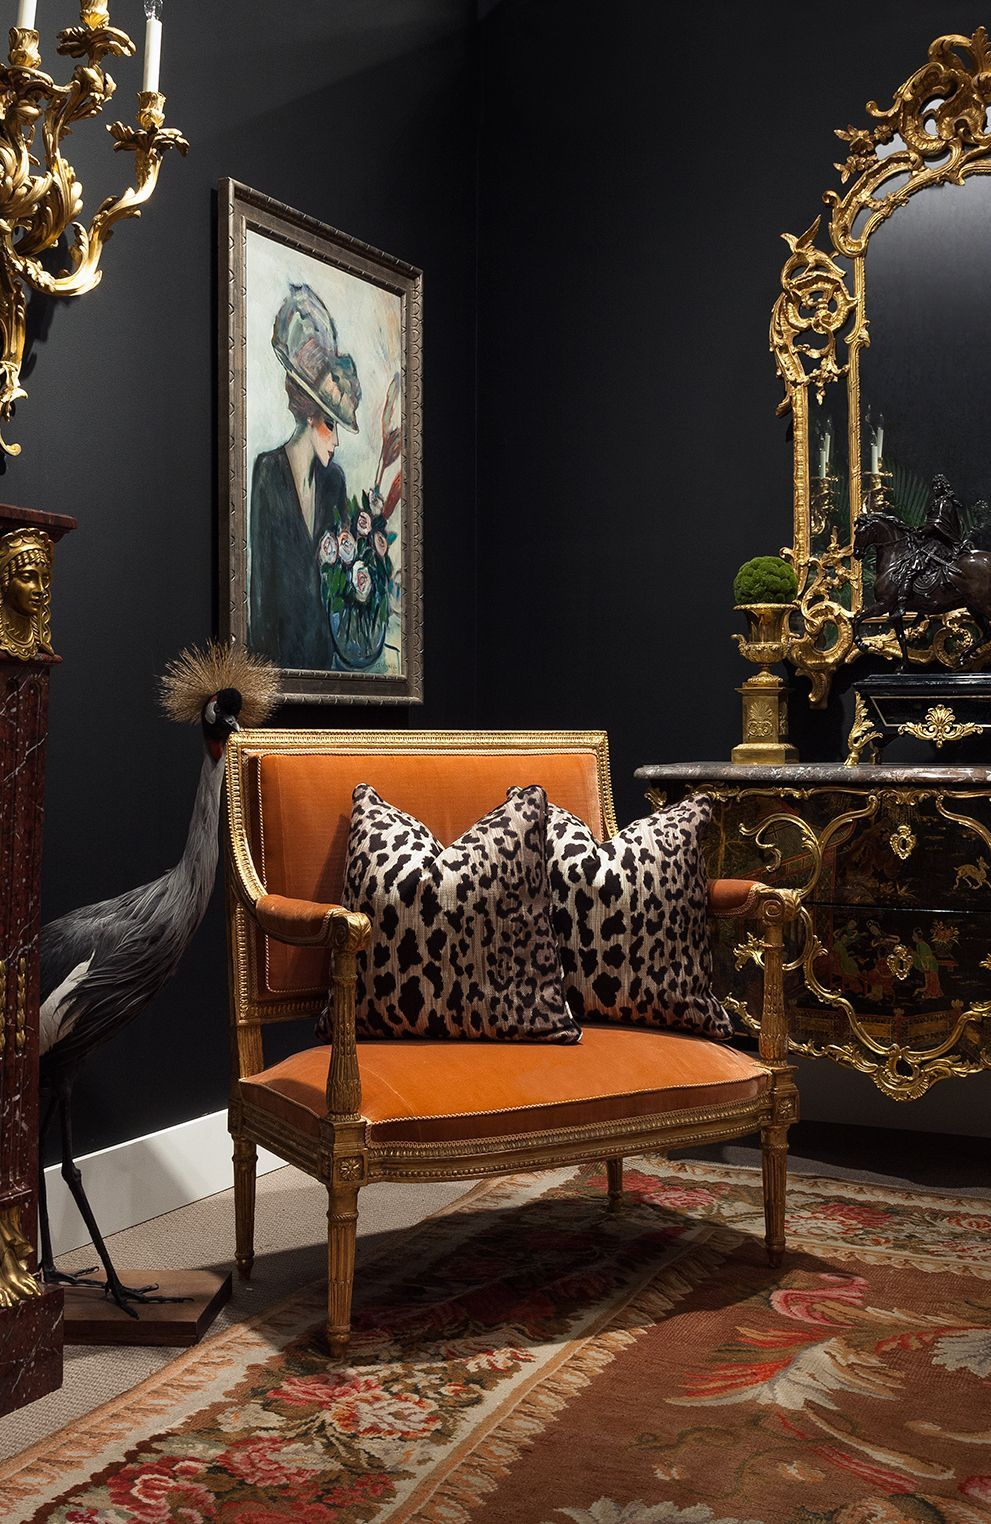 9 Excellent Cool Tricks: Decorative Pillows Couch Ideas decorative pillows bedroom blankets.Decorative Pillows